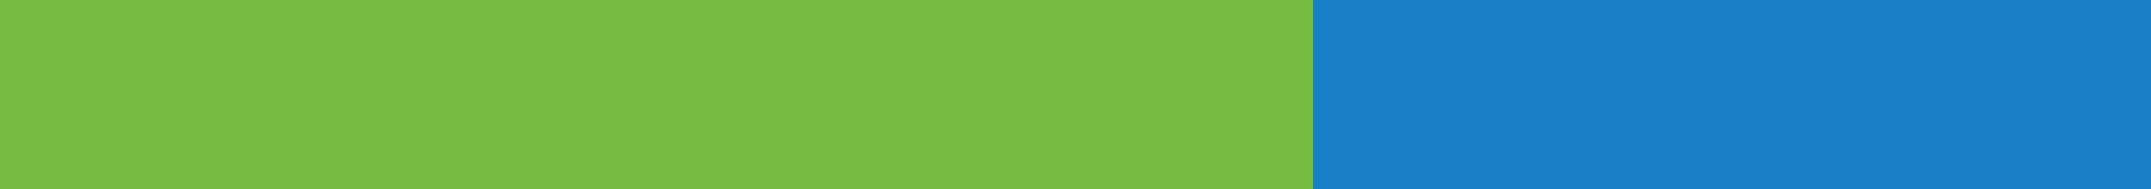 2018-savvydox_logo_final_Colour---Primary-logo---No-tag-v2.png